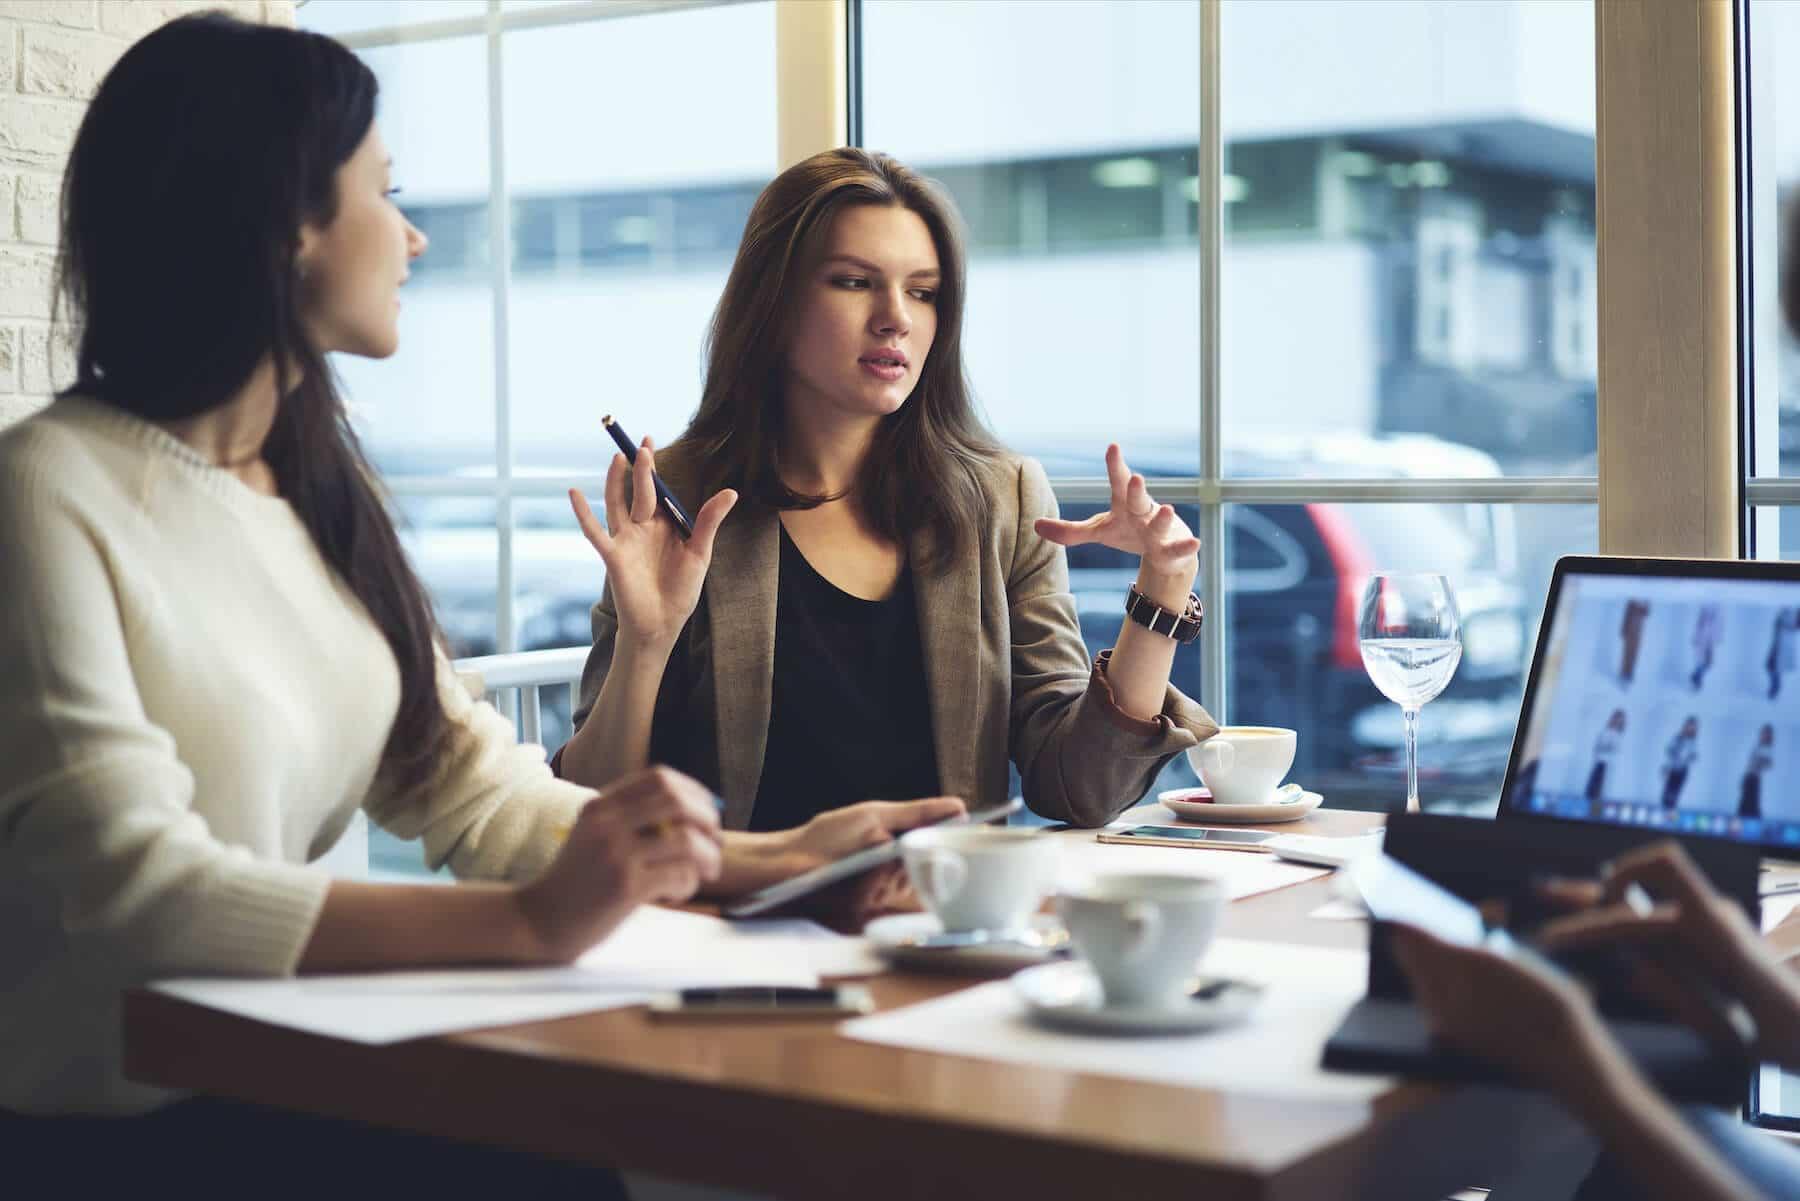 Entrepreneurship and MSMEs